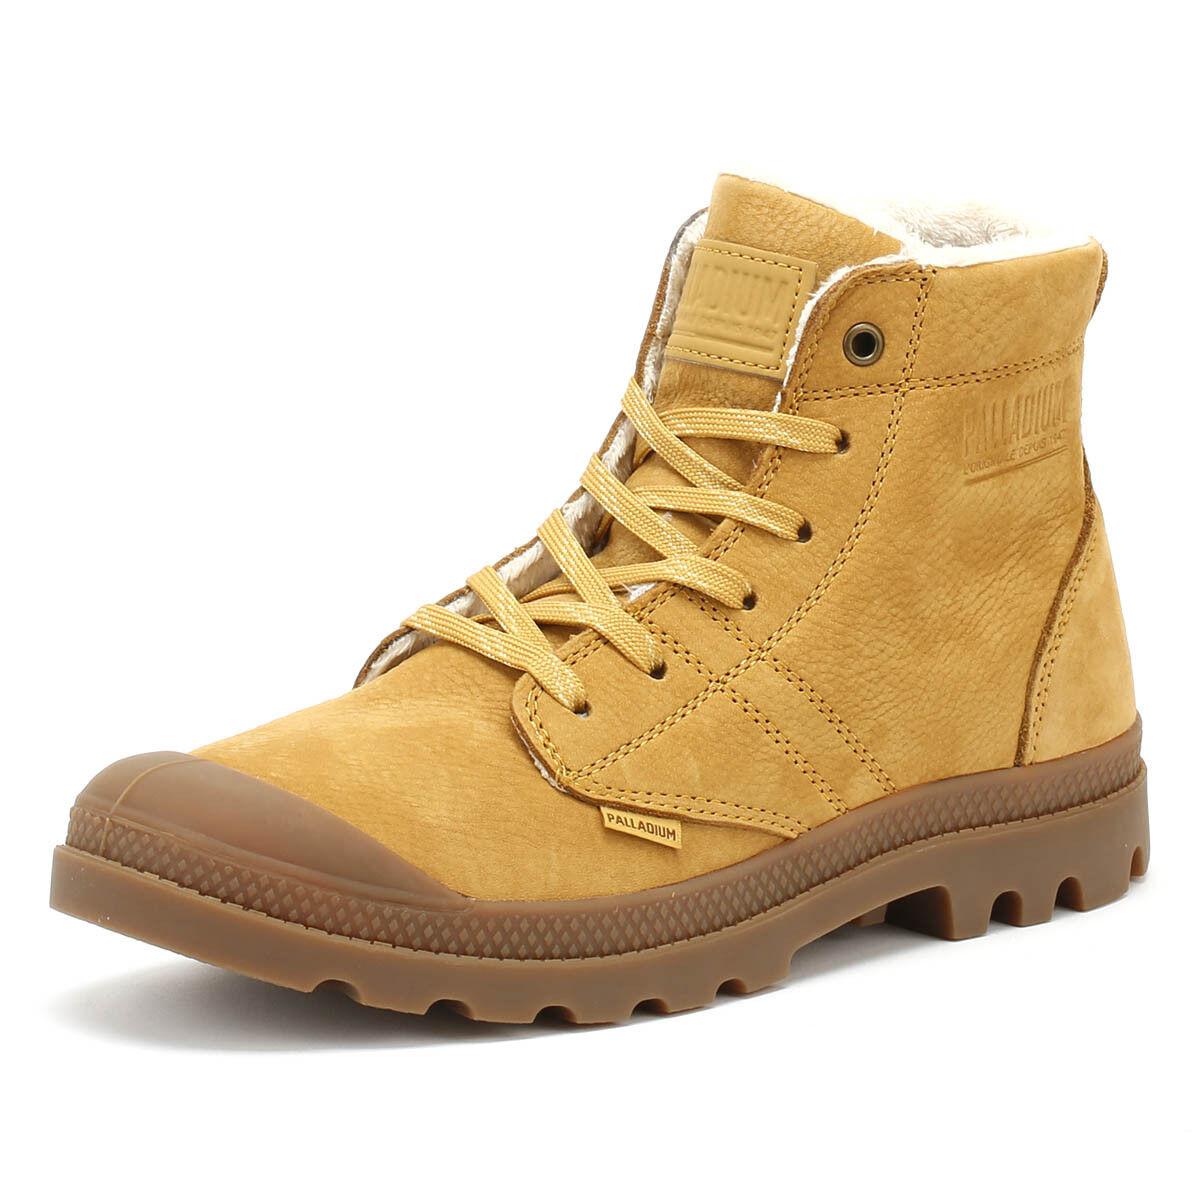 Palladium Pallabrousse Leather S Mens Boots Beige Lace Up Warm Winter shoes